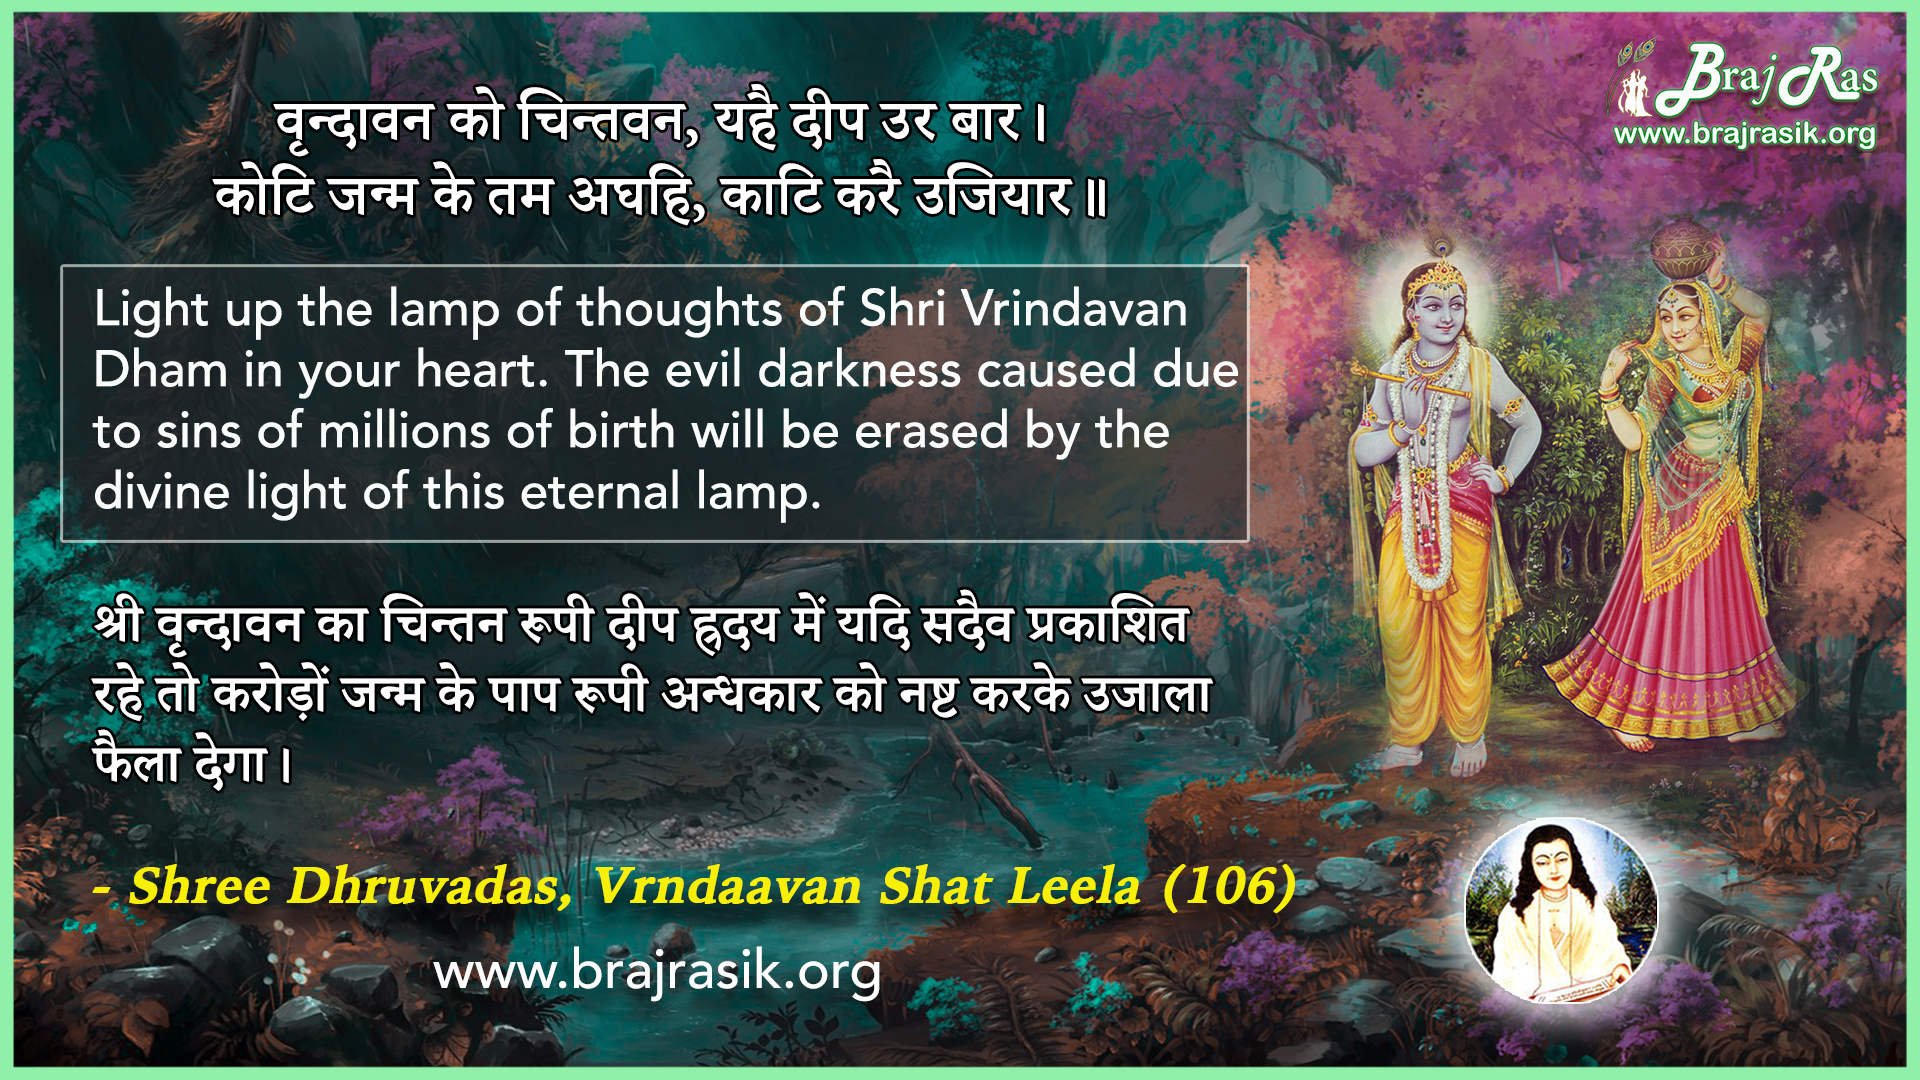 Vrindavan Ko Chintavan, Yahai Deep Ur Baar - Shree Dhruvadas, Vrndaavan Shat Leela (106)